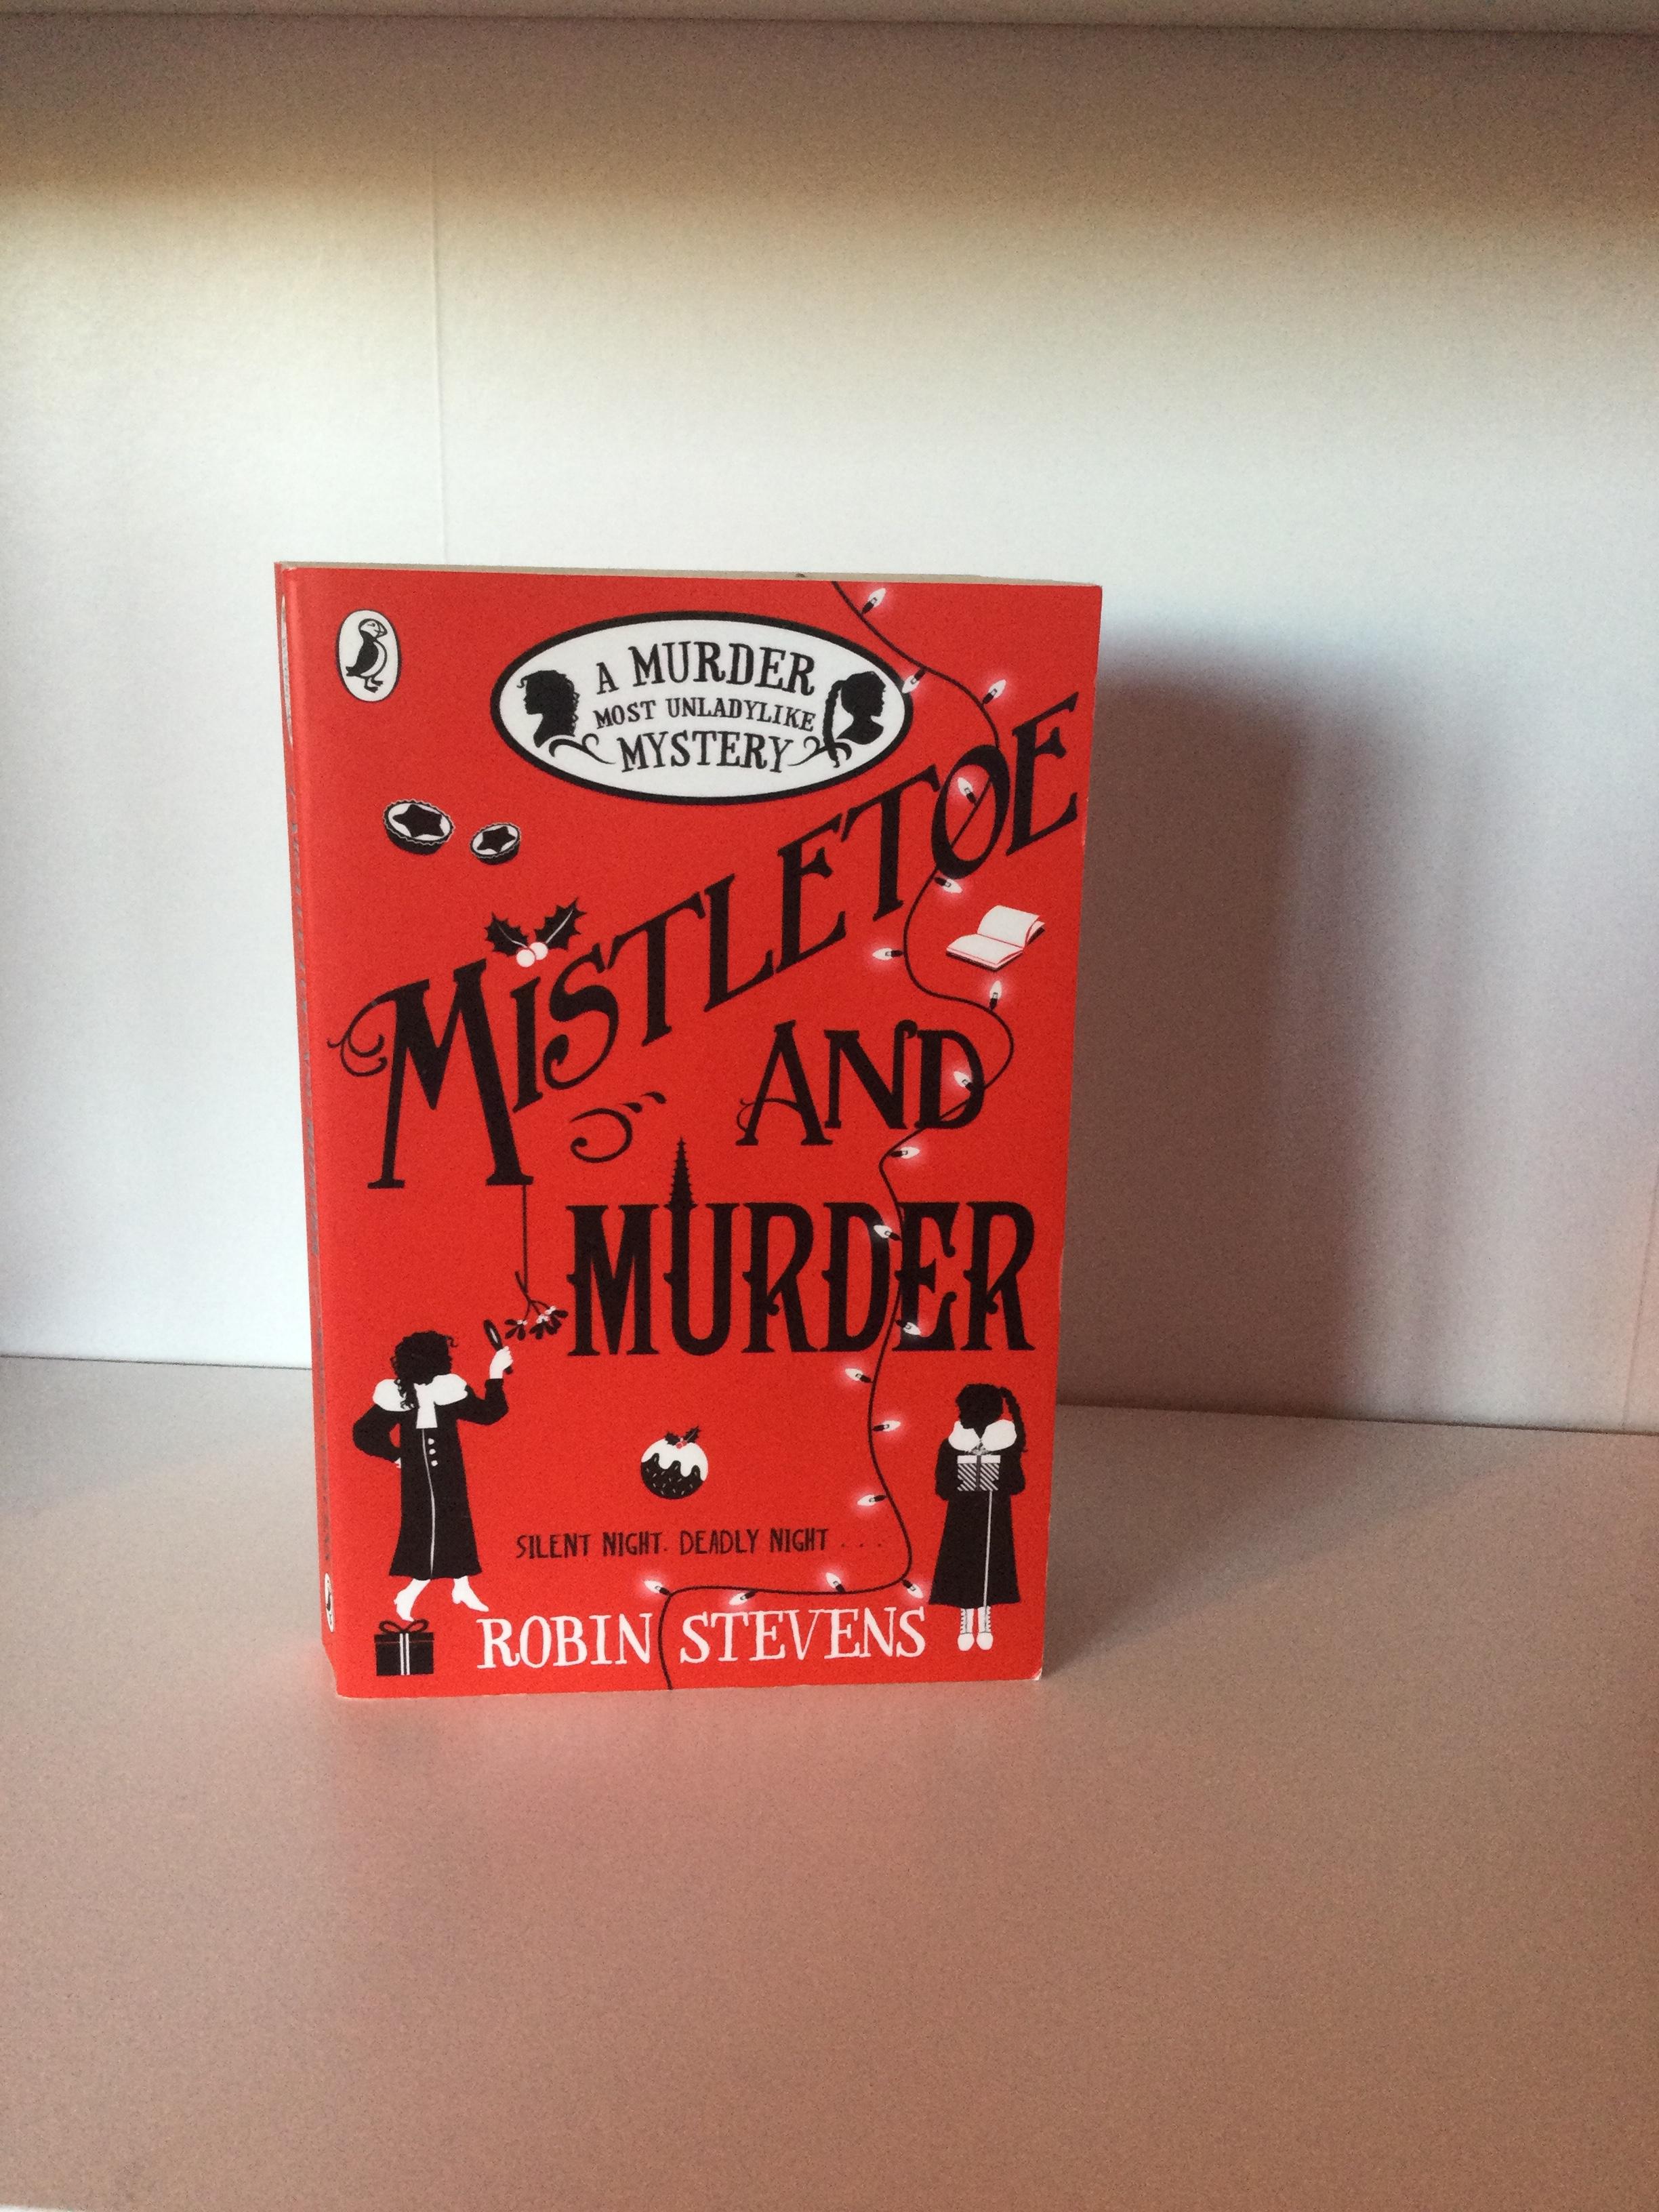 The cover of Mistletoe and Murder by Robin Stevens